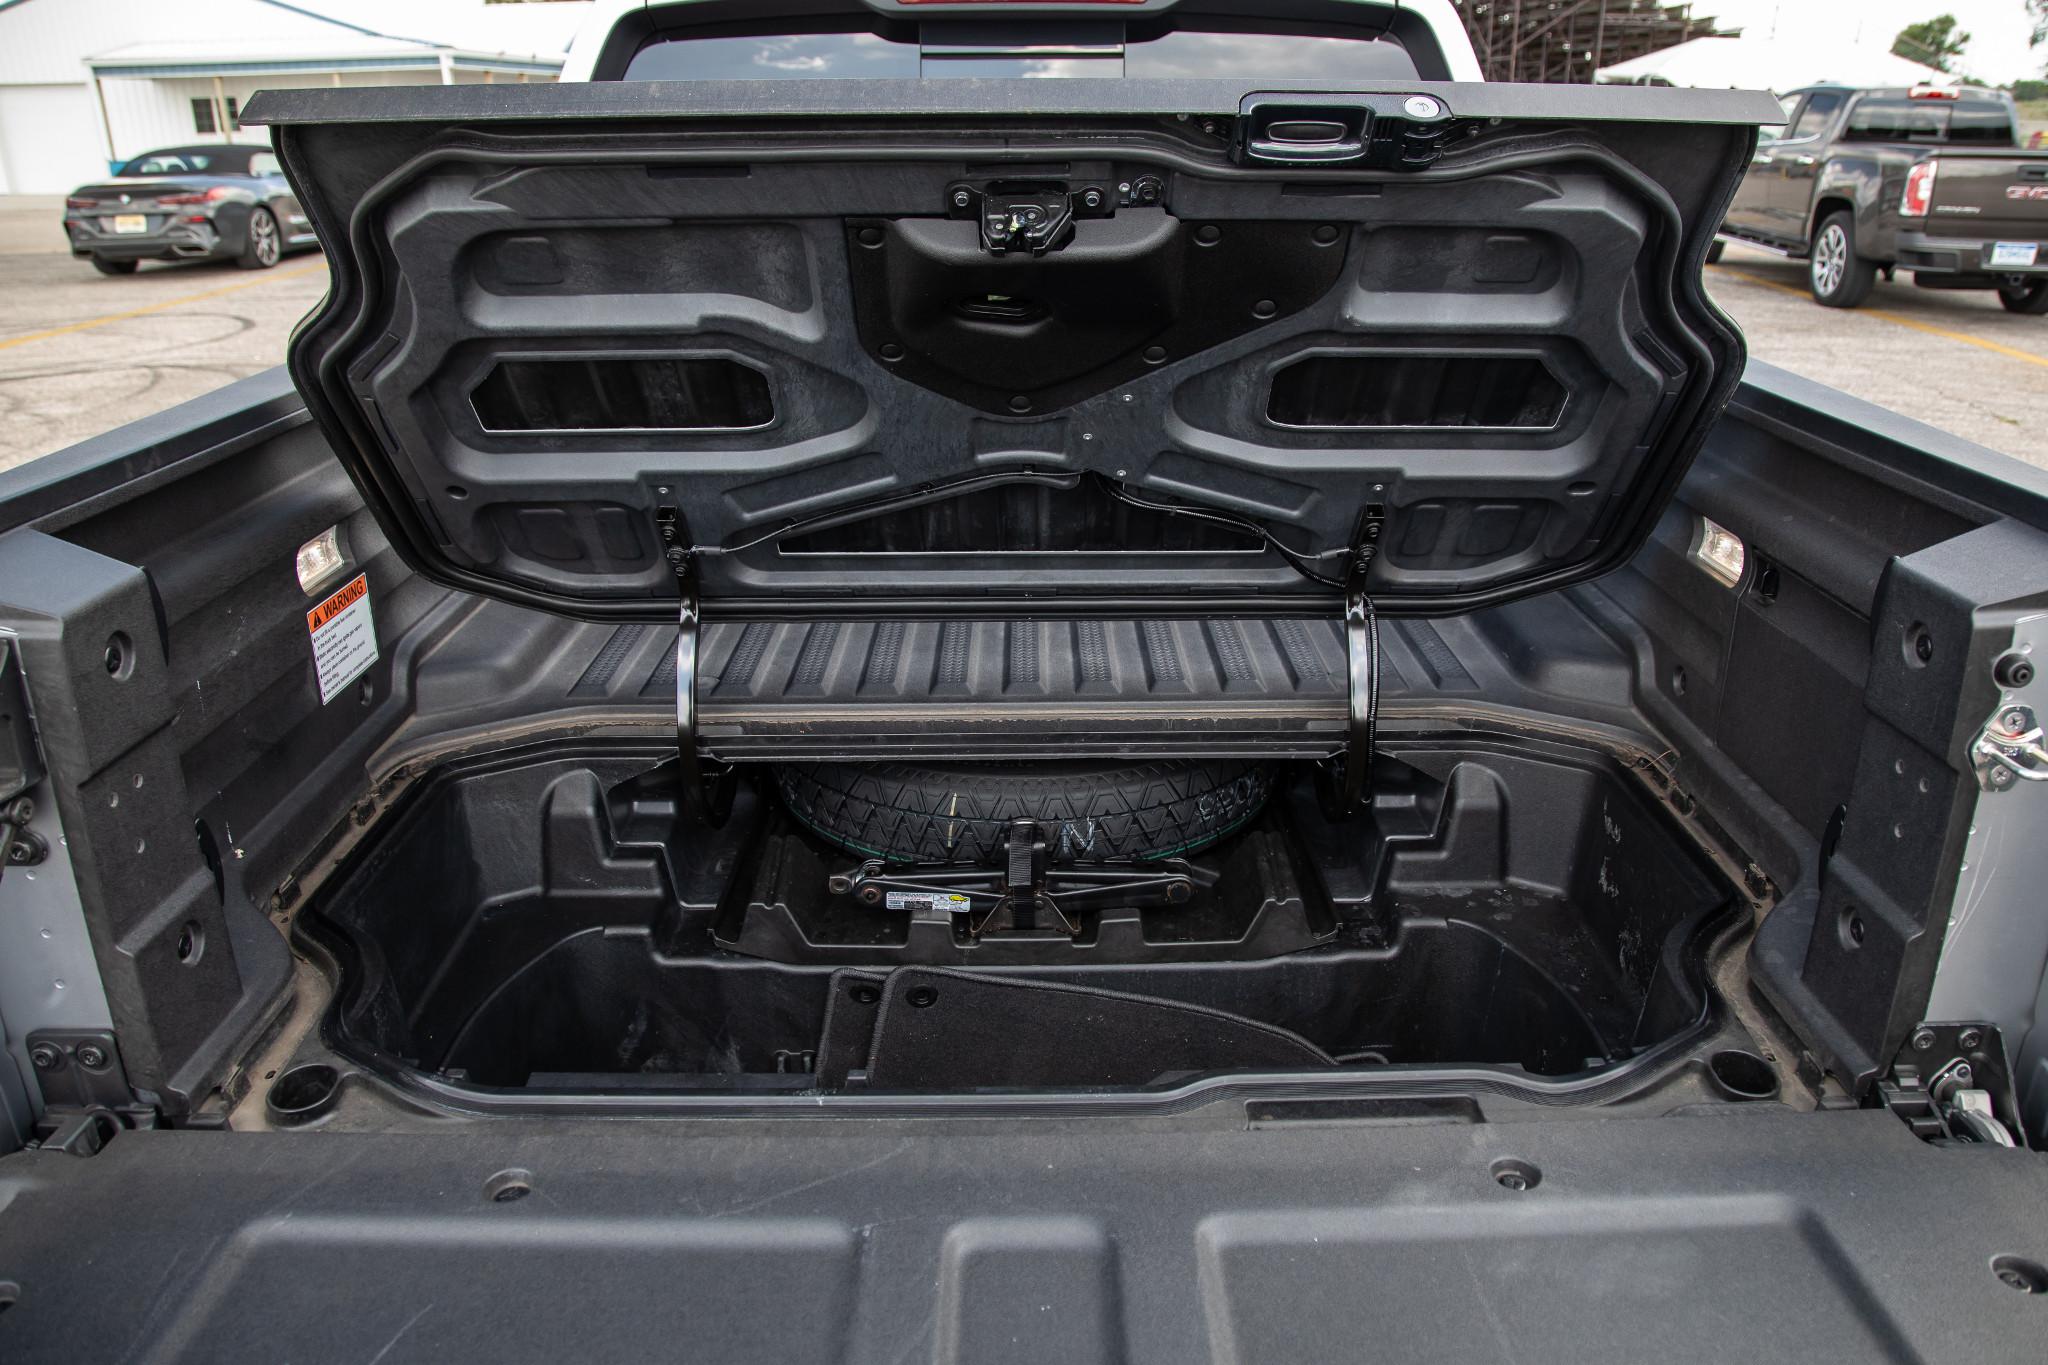 honda-ridgeline-2019-22-bed--exterior--rear--storage.jpg